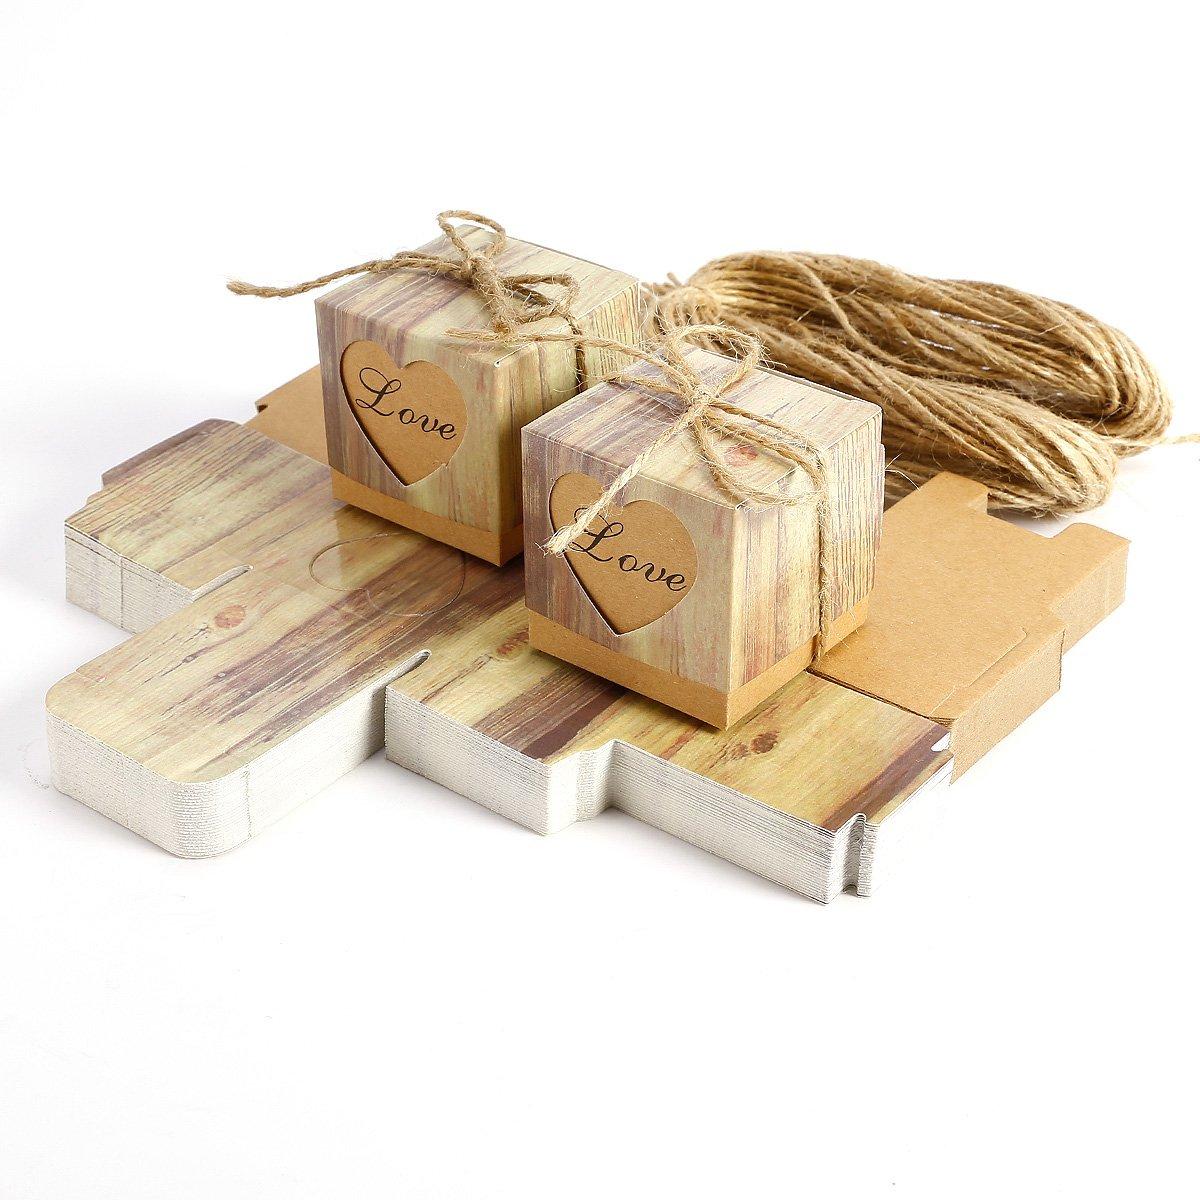 50PCS Heart Love rustico Sweet laser Cut confetti, caramelle scatole regalo